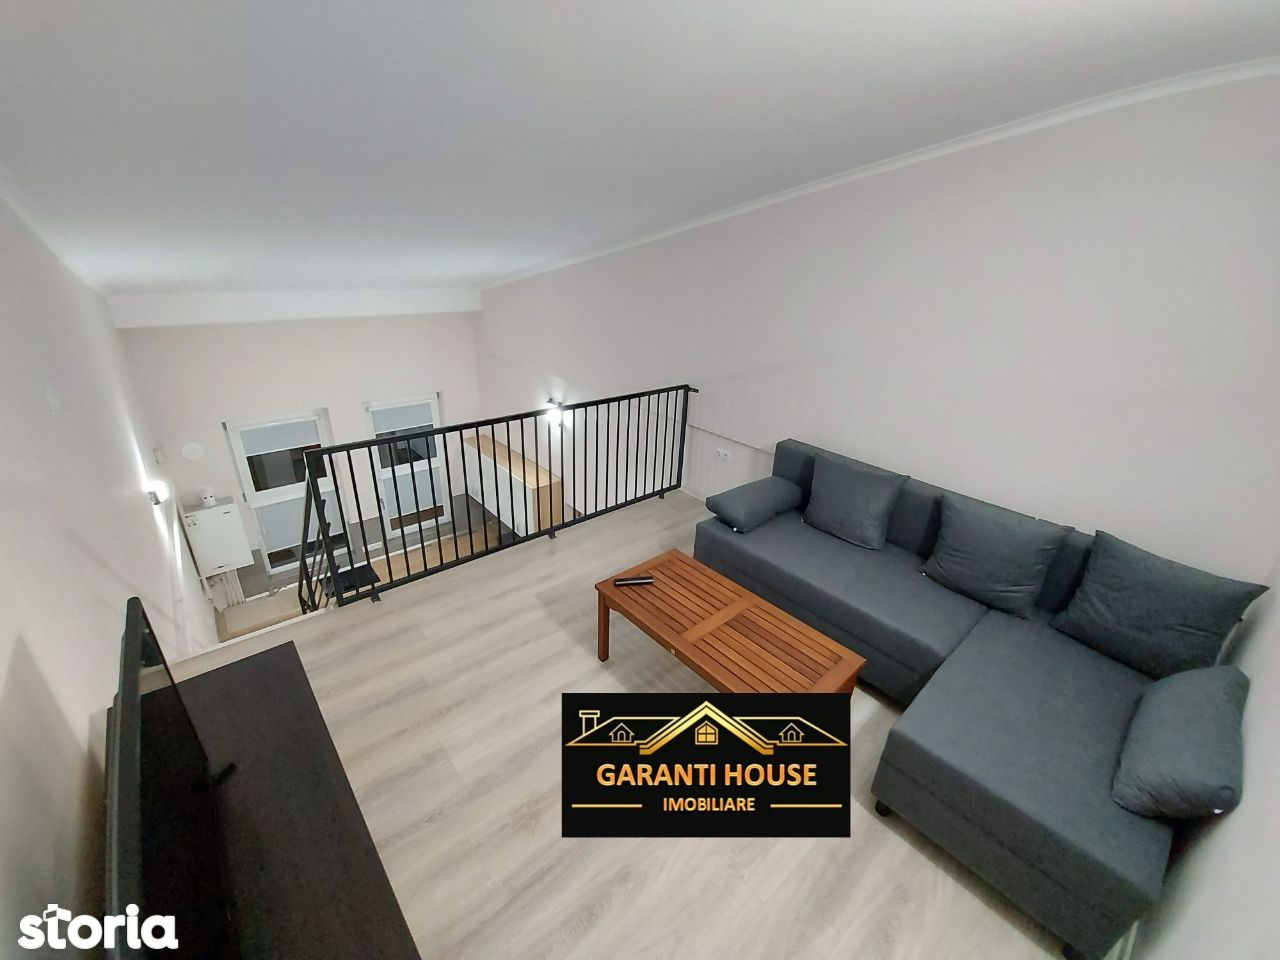 Babes, bloc nou, apartament cu 3 camere pe 2 nivele, 65 800€ neg.